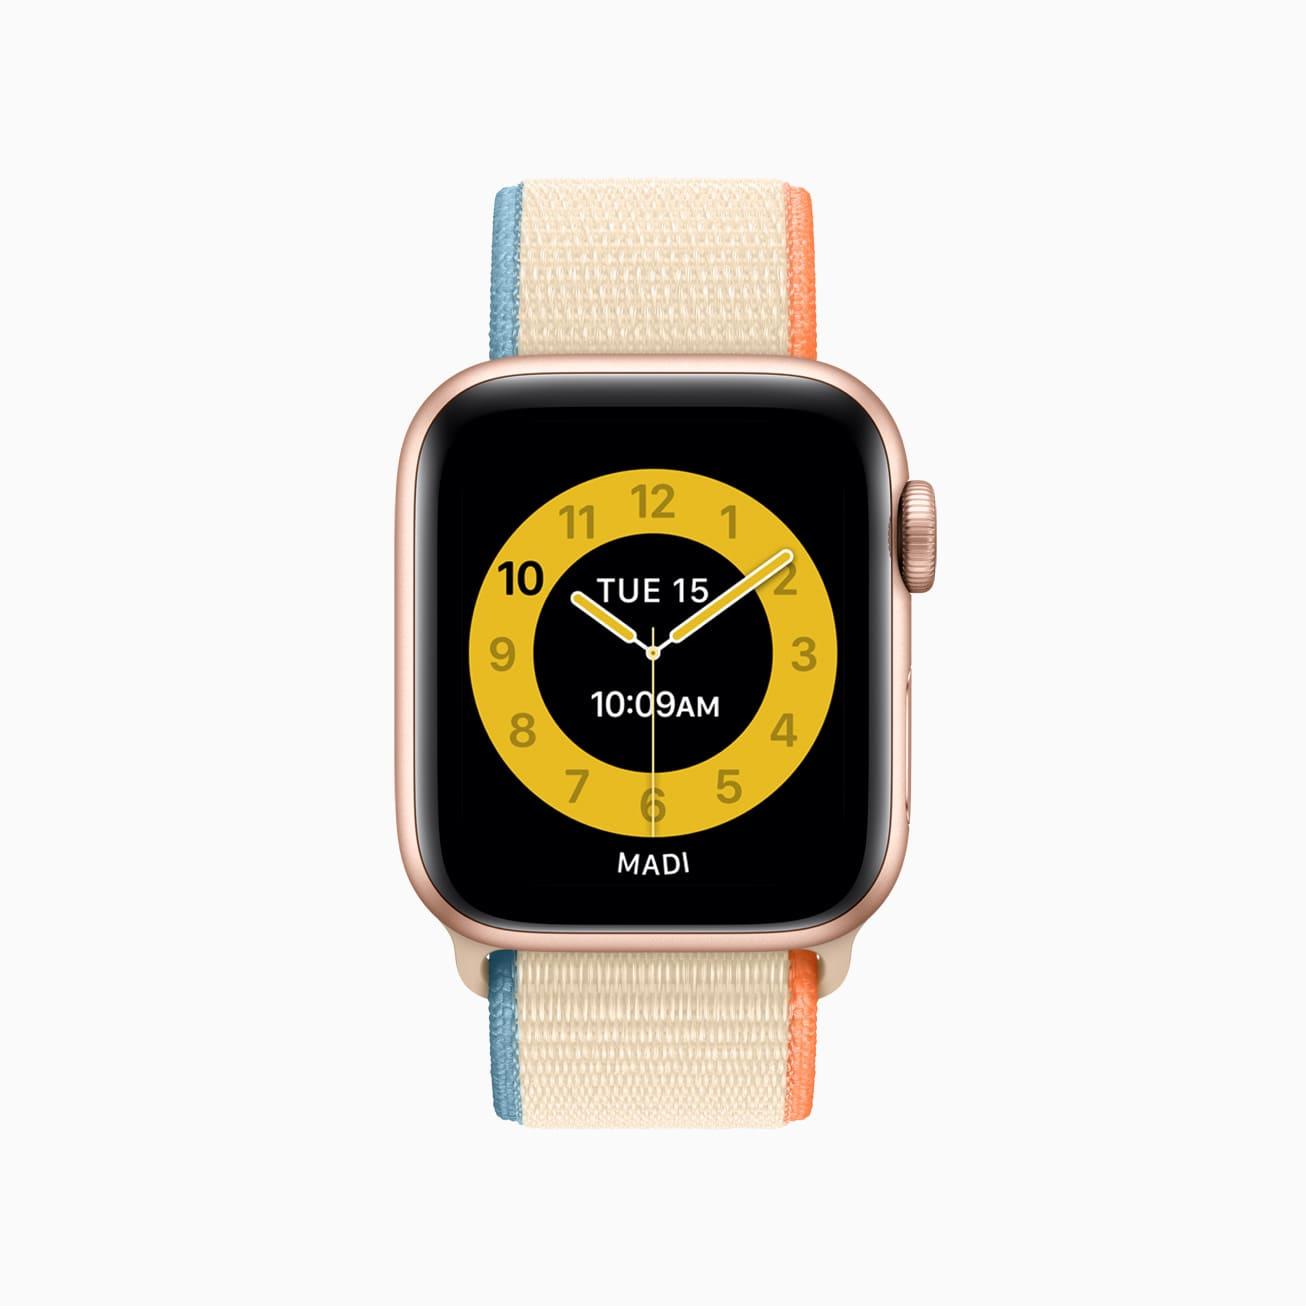 watch-series-6-school-time-watchface